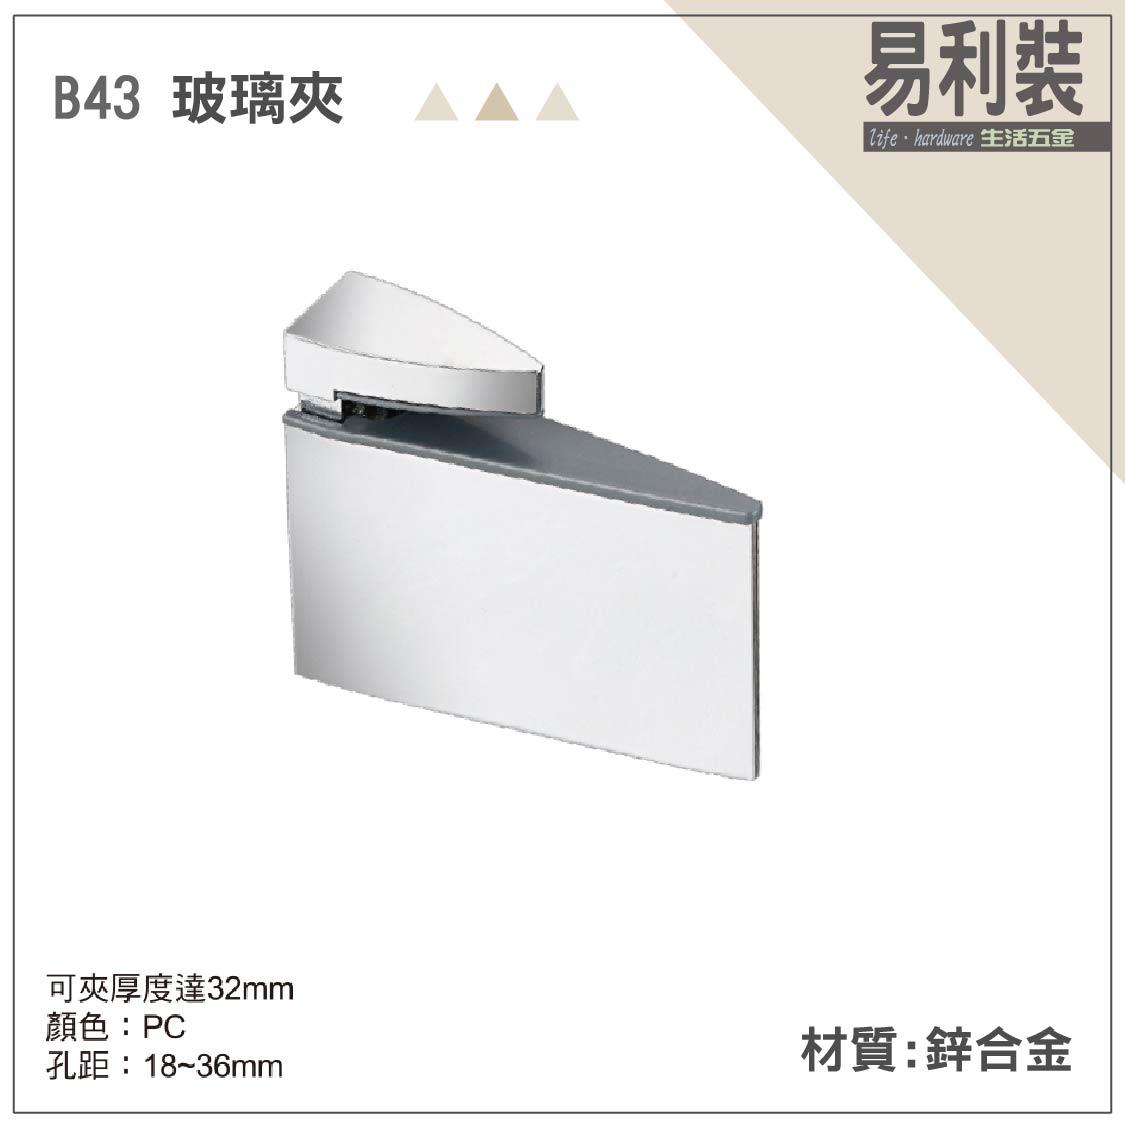 【 EASYCAN  】B43 玻璃夾 易利裝生活五金 浴室 廚房 房間 臥房 衣櫃 小資族 辦公家具 系統家具 0